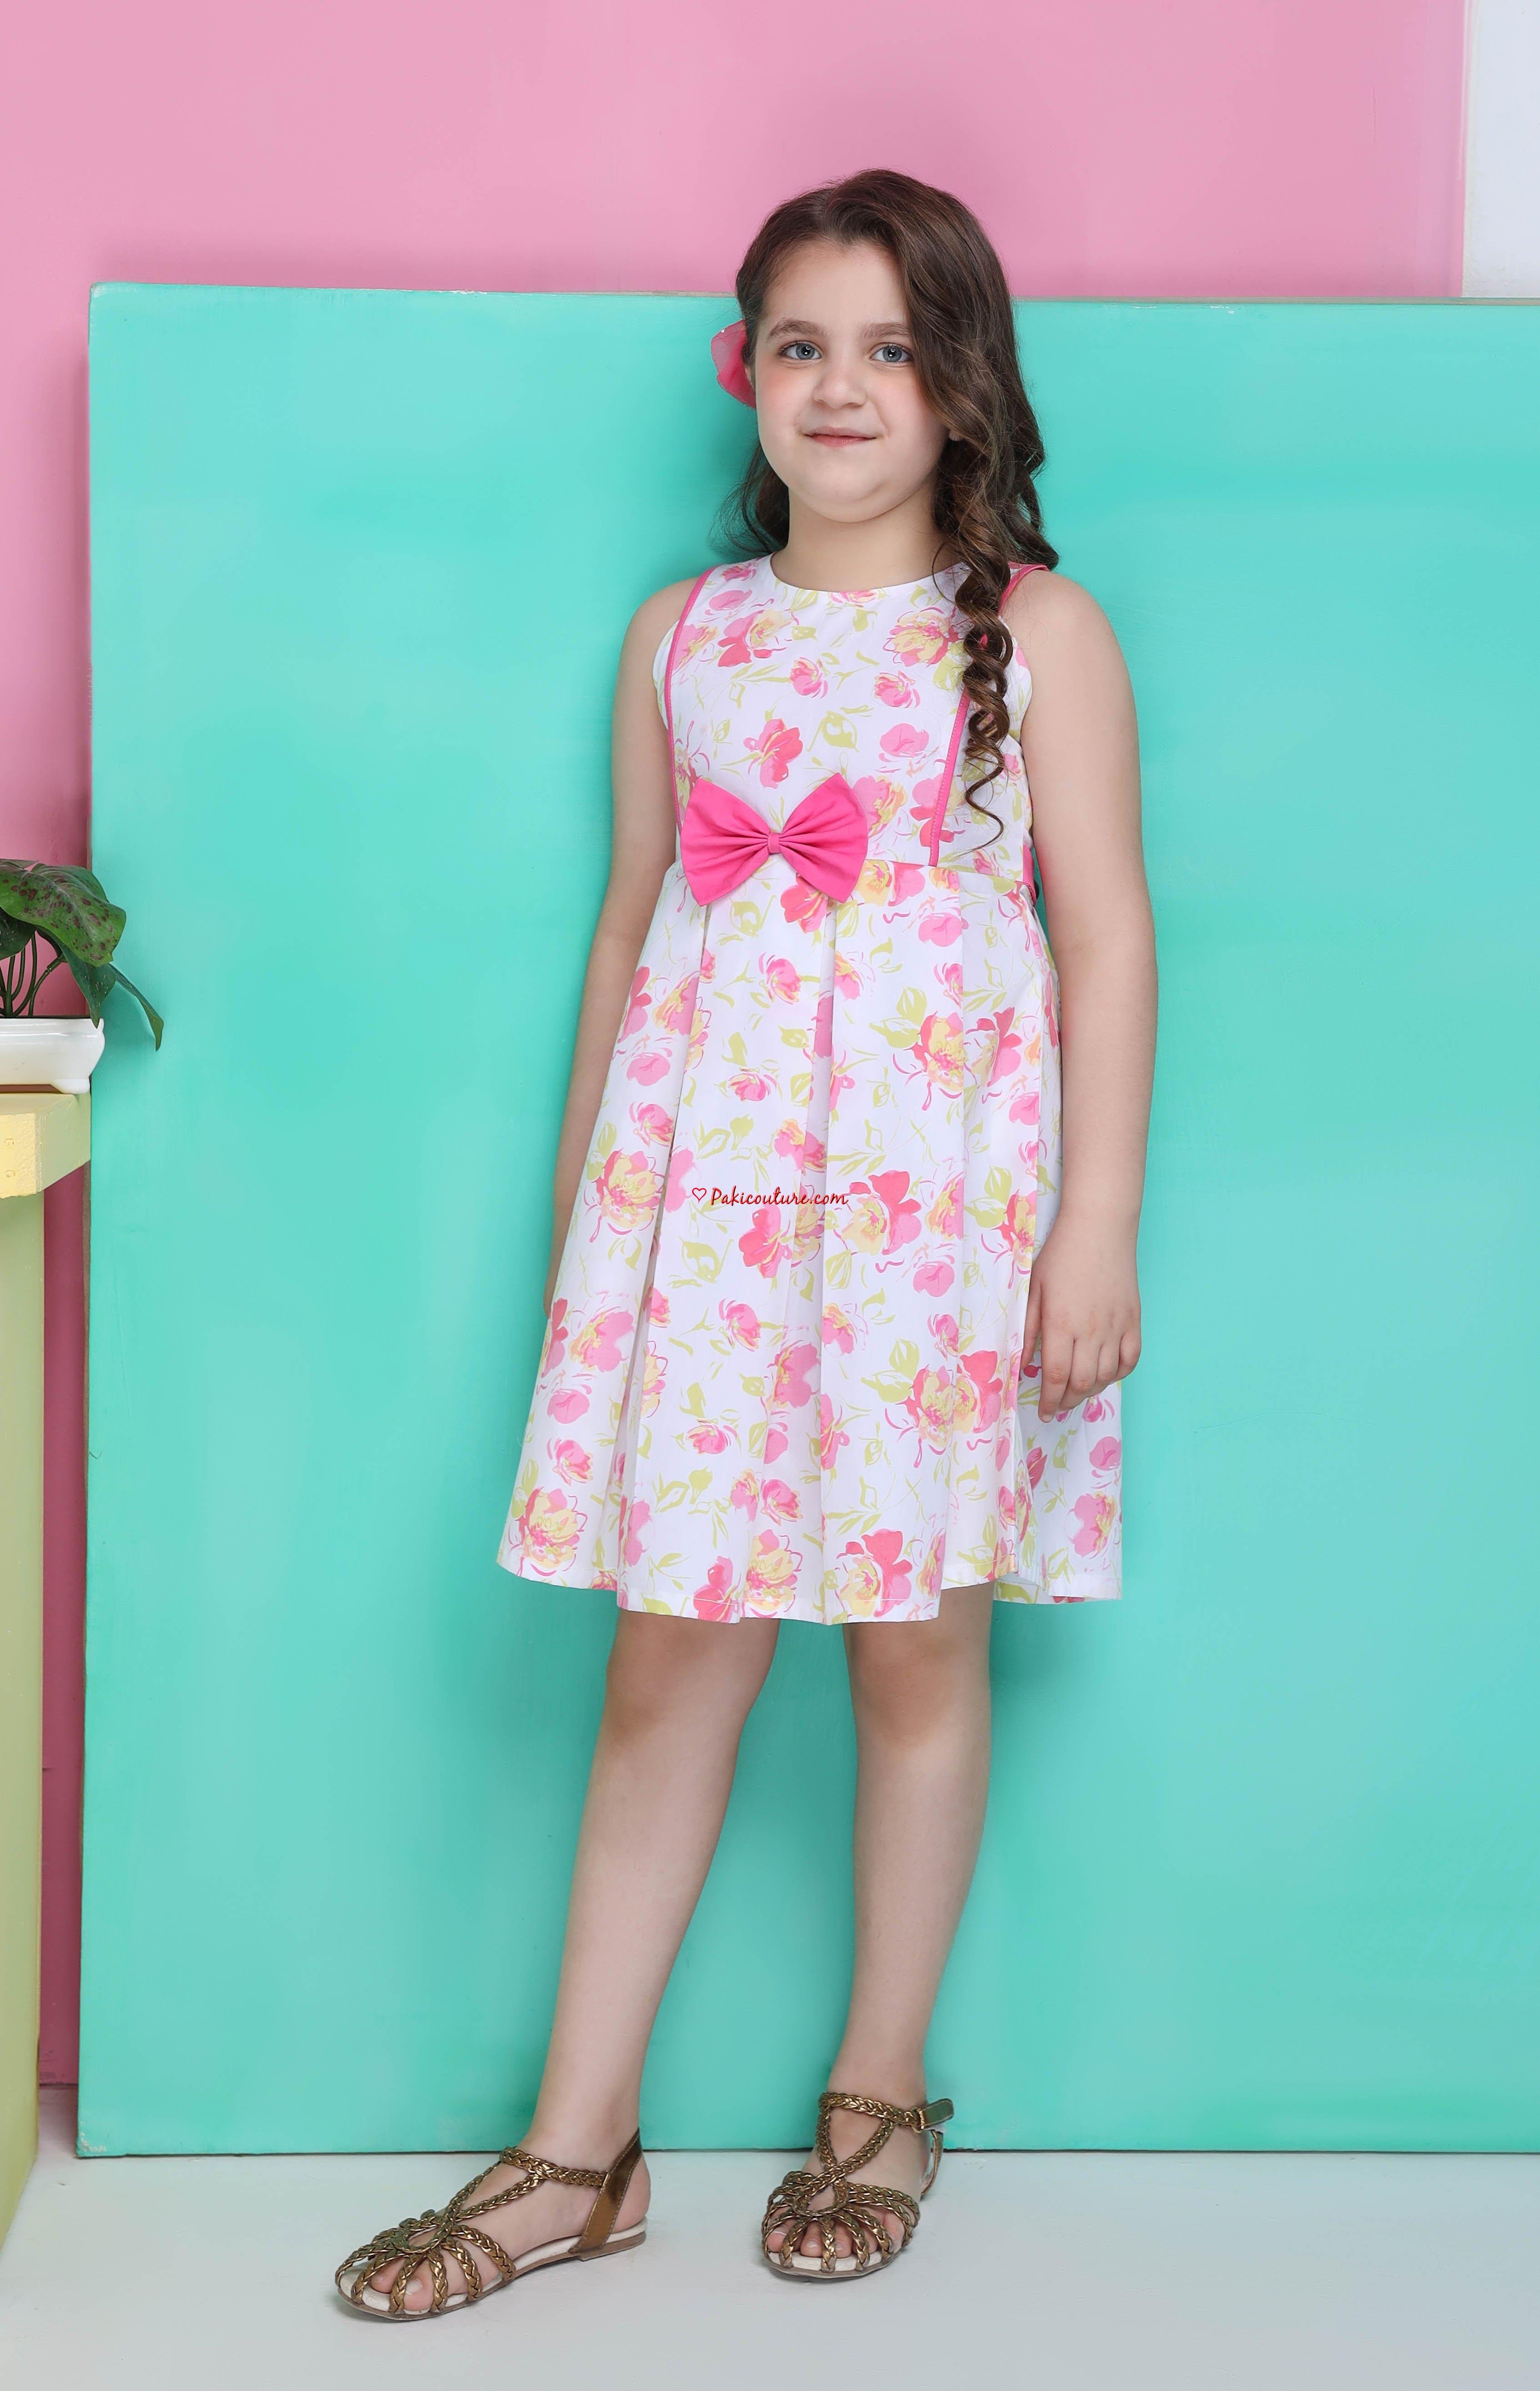 Pink Petals Girls Party Dresses Collection 2020 Shop Online Buy Pakistani Fashion Dresses Pakistani Branded Latest Clothes